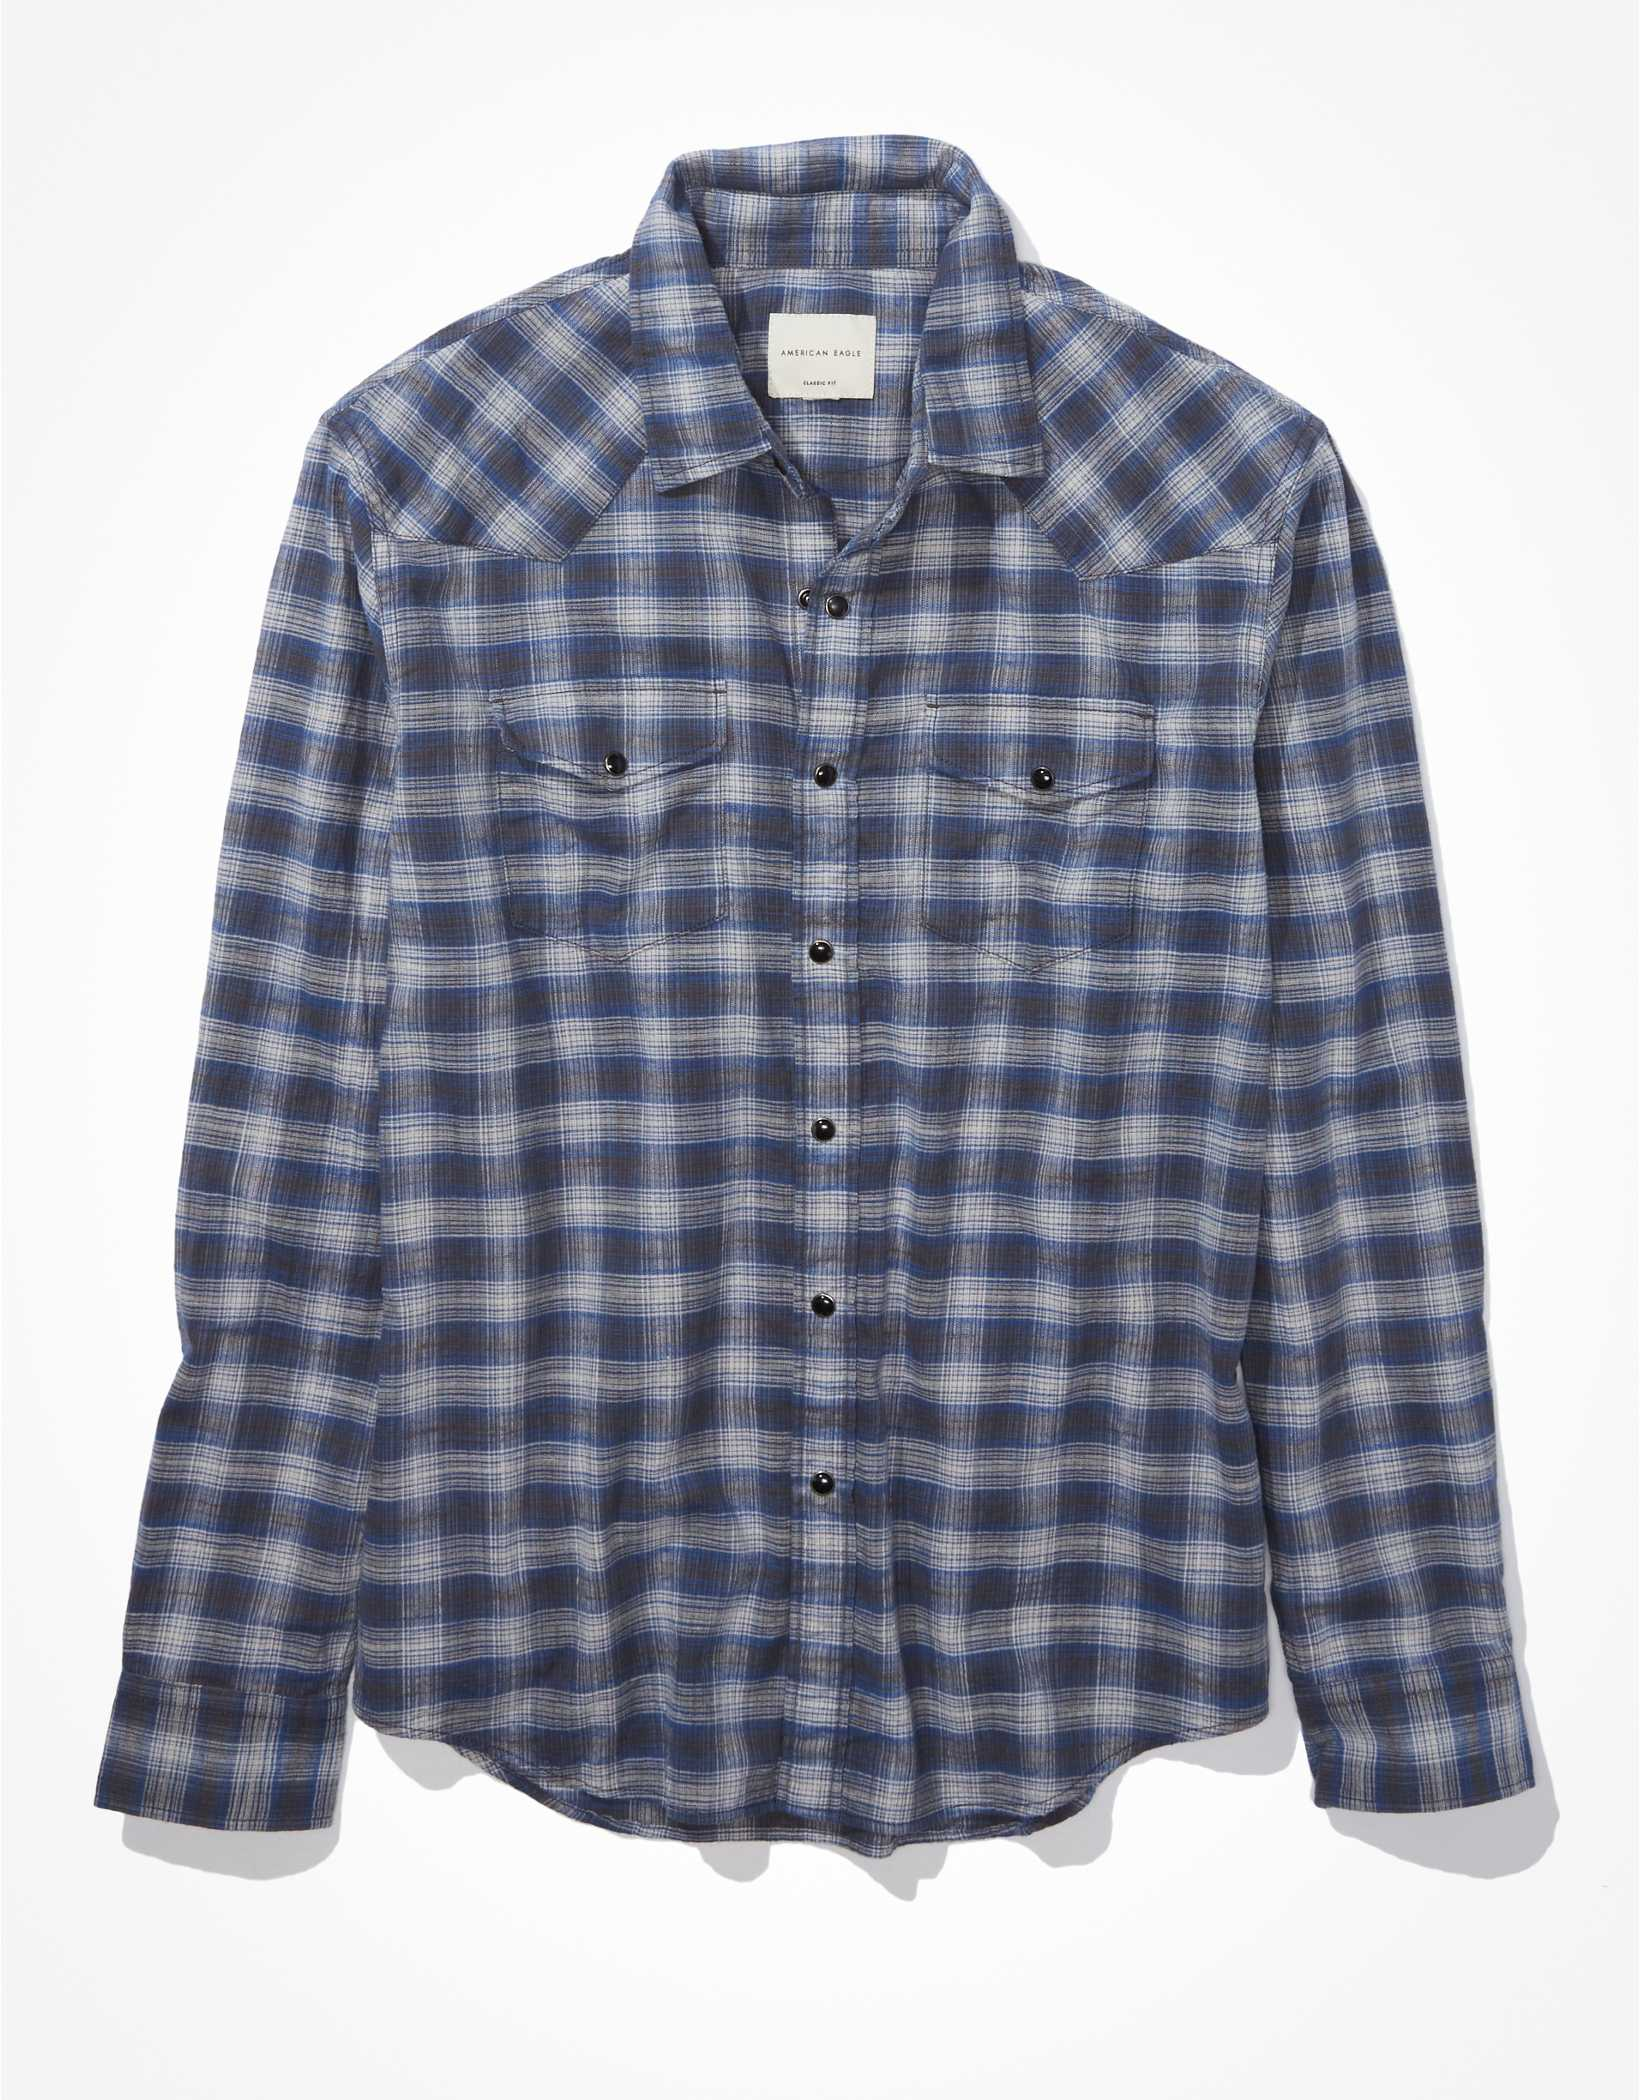 AE Super Soft Plaid Button-Up Shirt